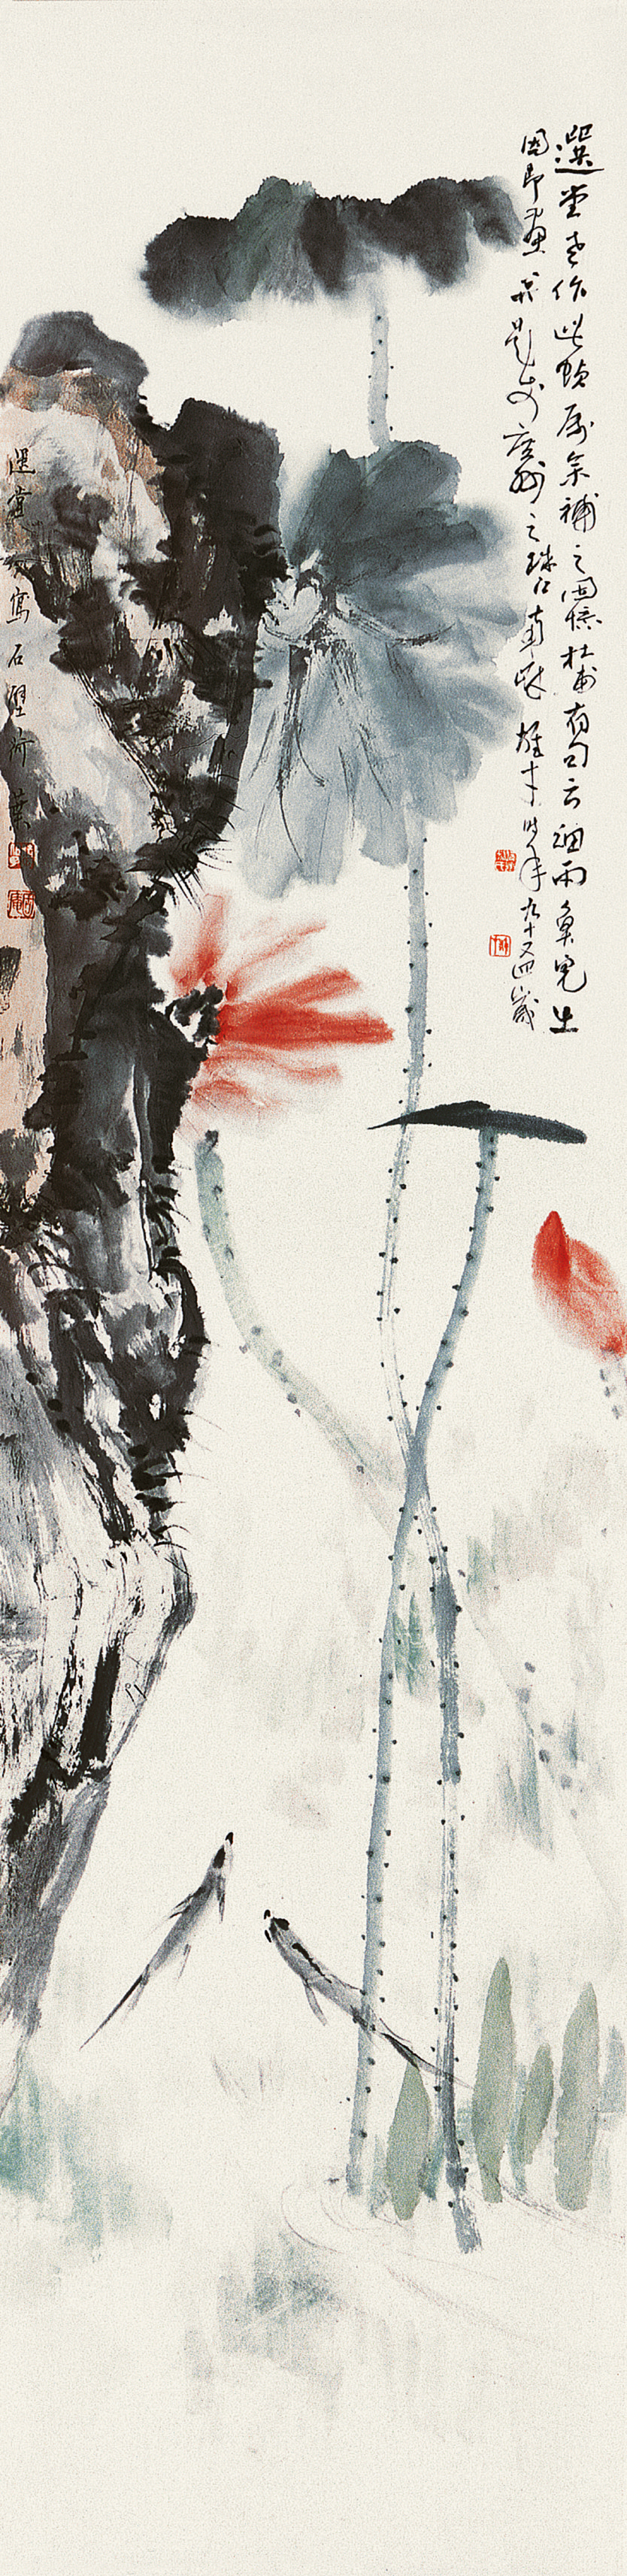 Jao Tsung-I   Li Xiong-cai